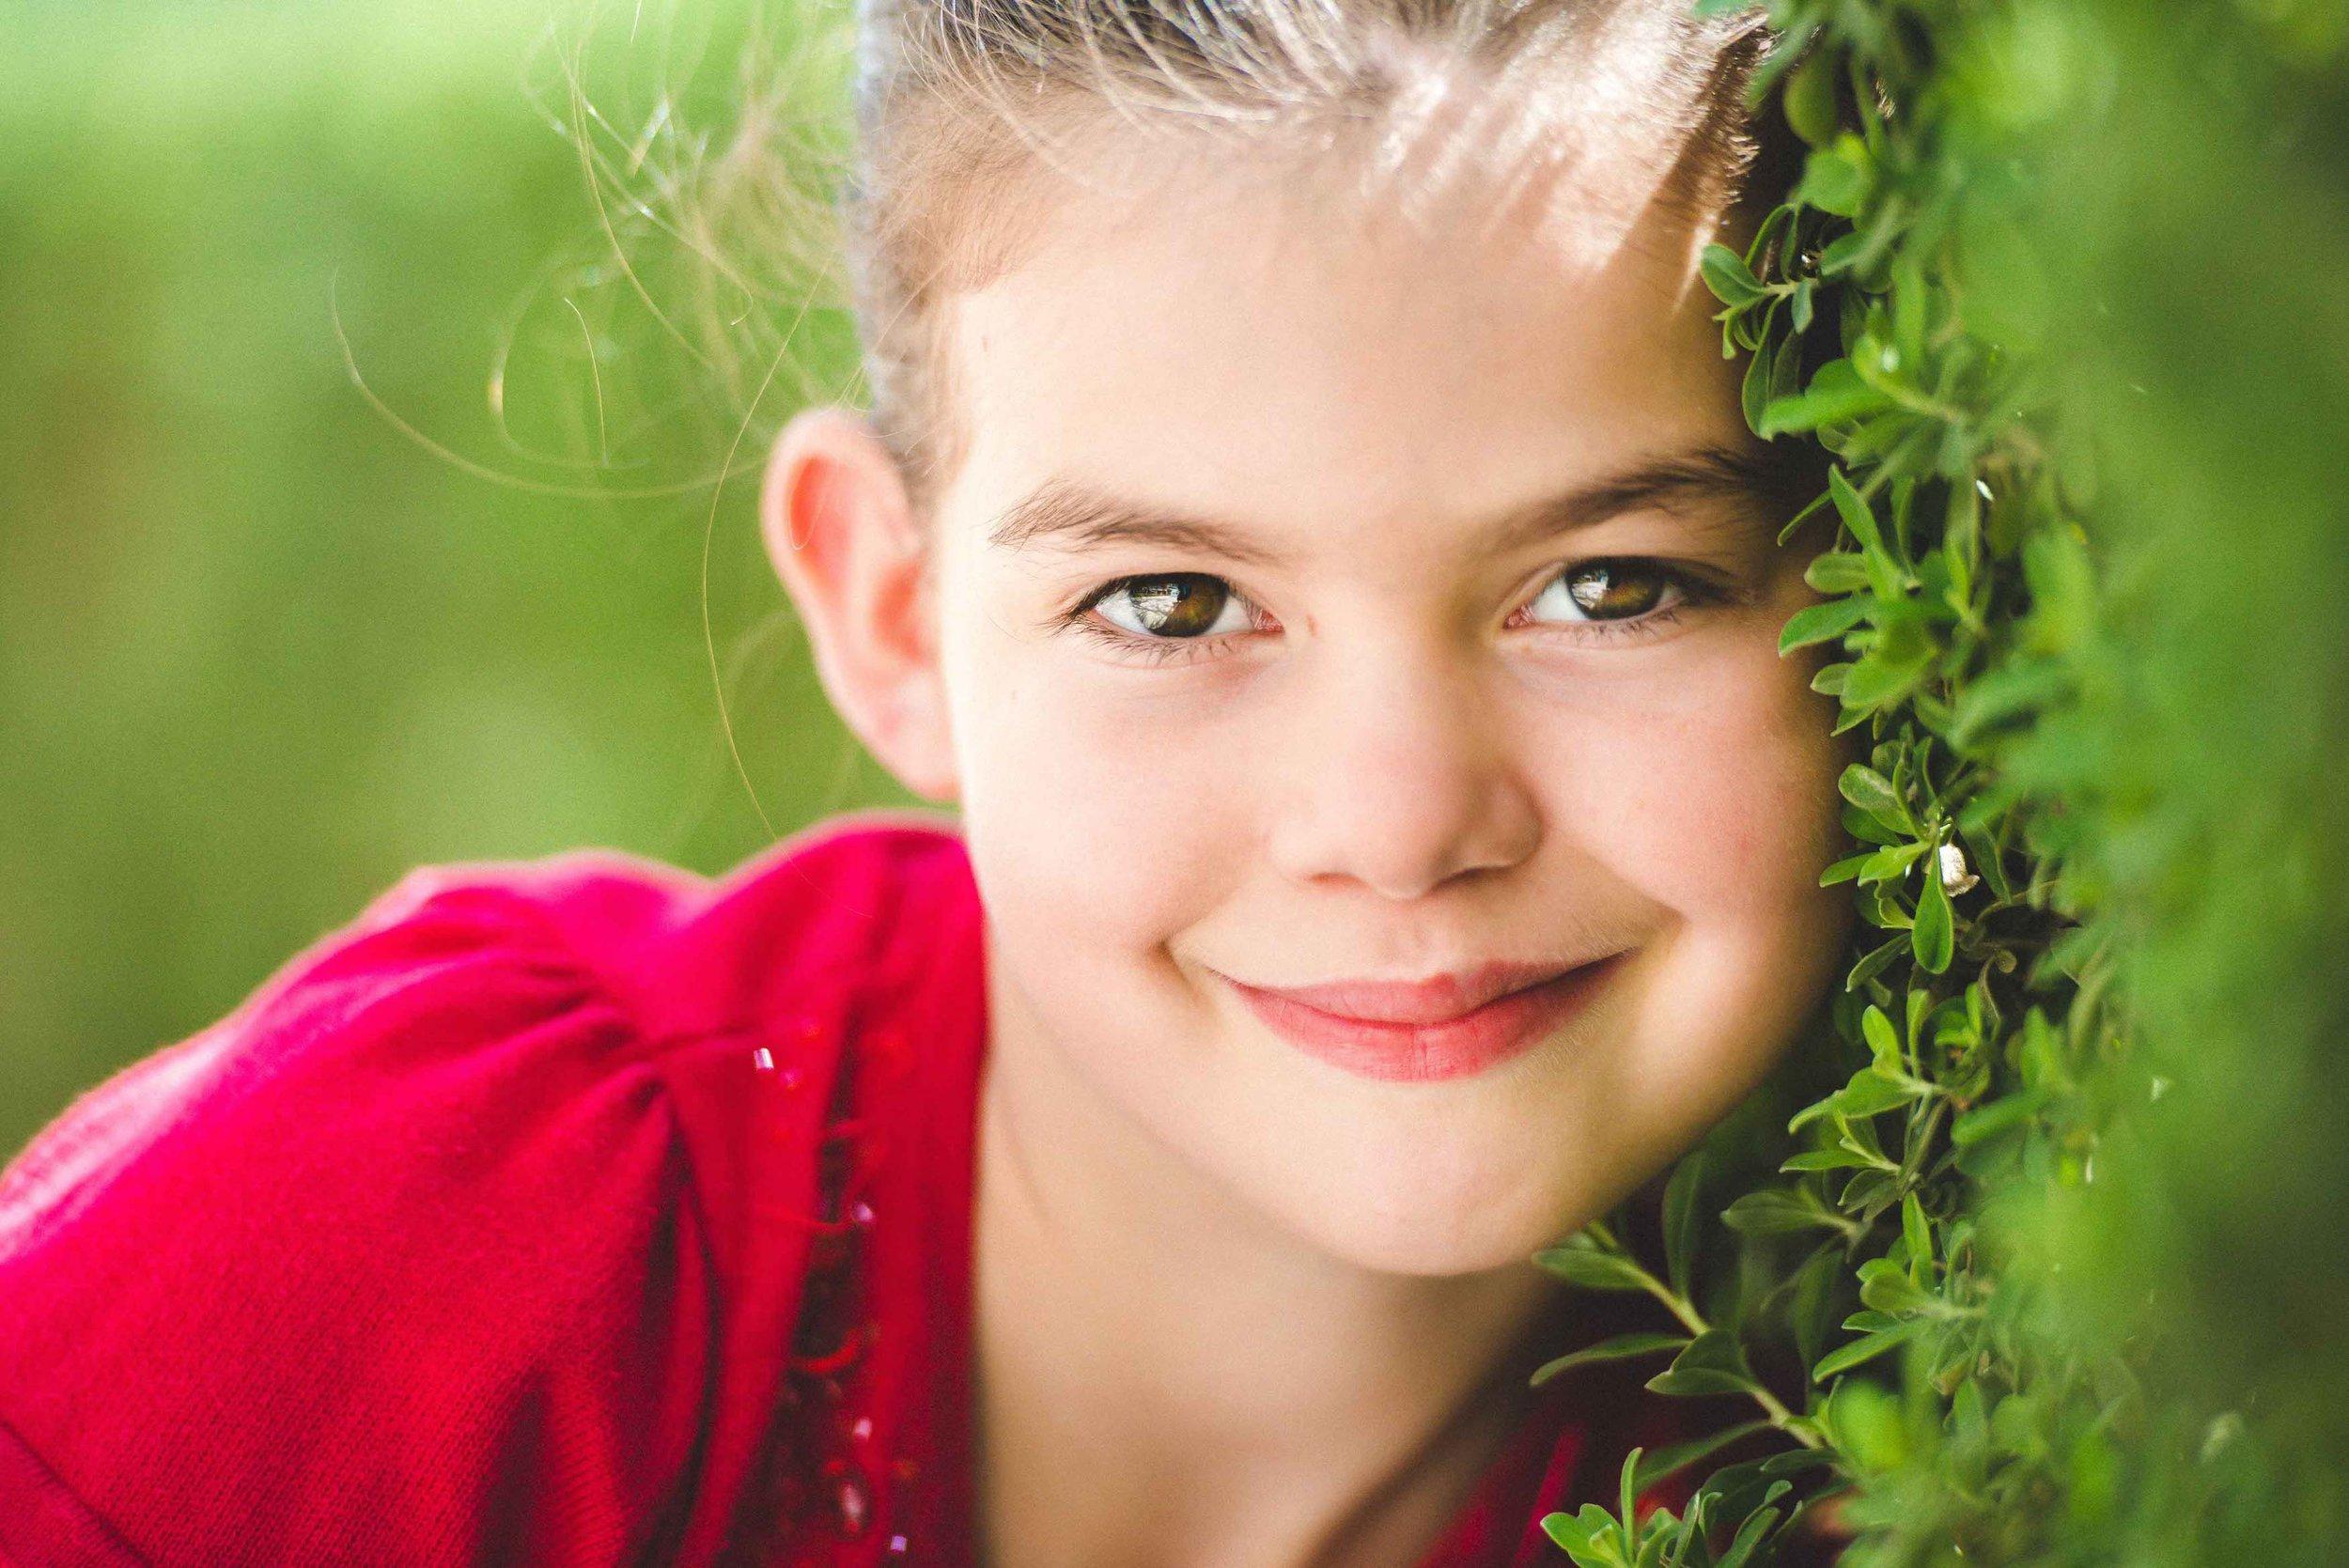 ChildPhotographyImprint-2.jpg